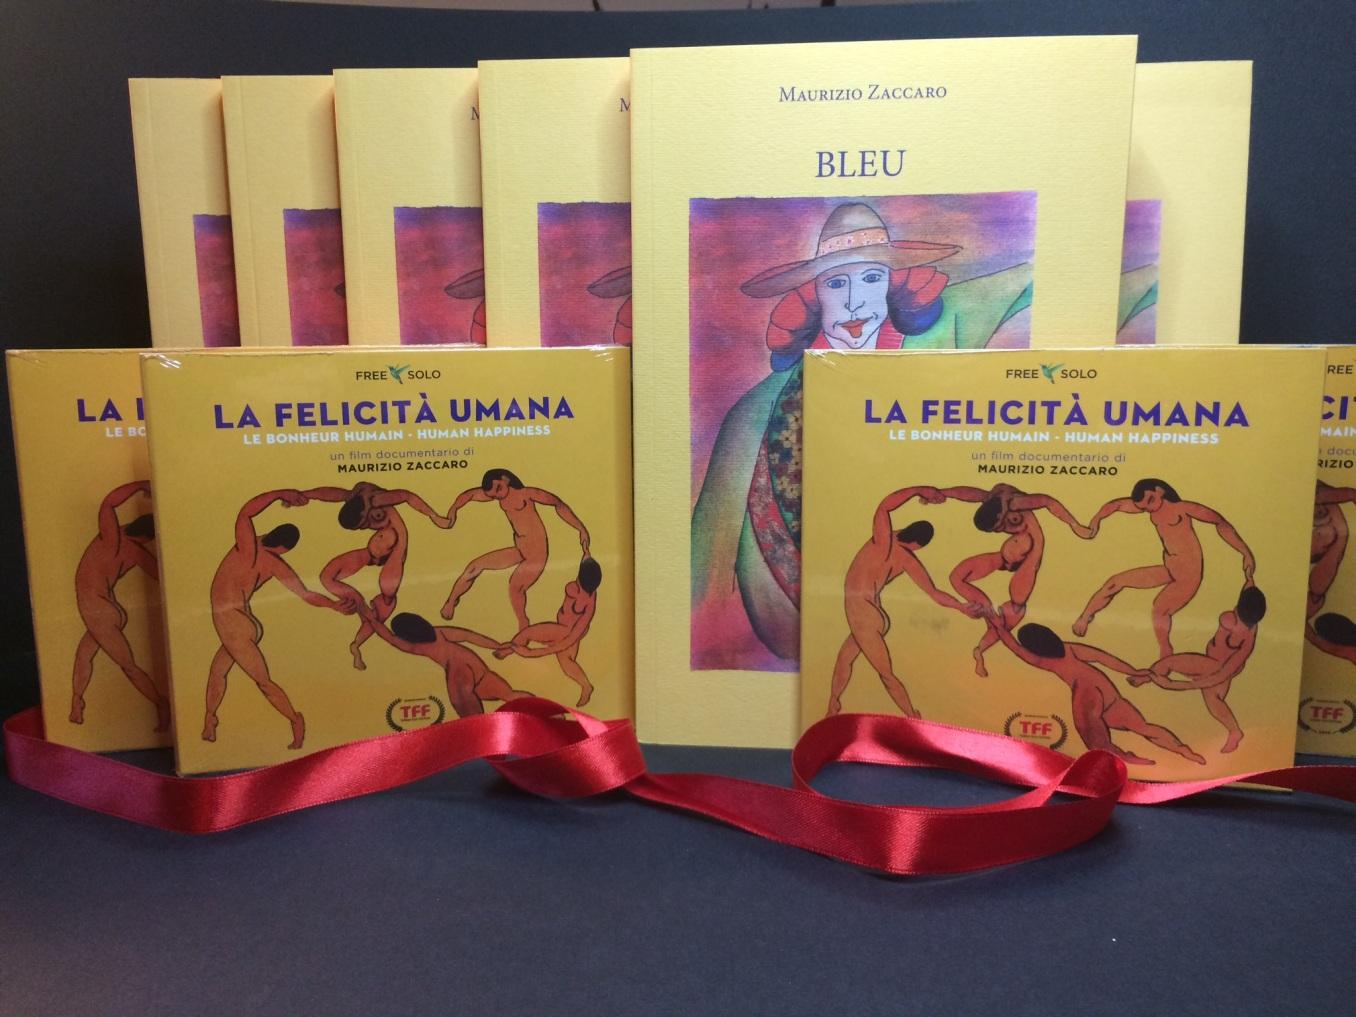 LA FELICITA' UMANA + BLEU. OFFERTA 28 EURO (spedizione compresa in italia)